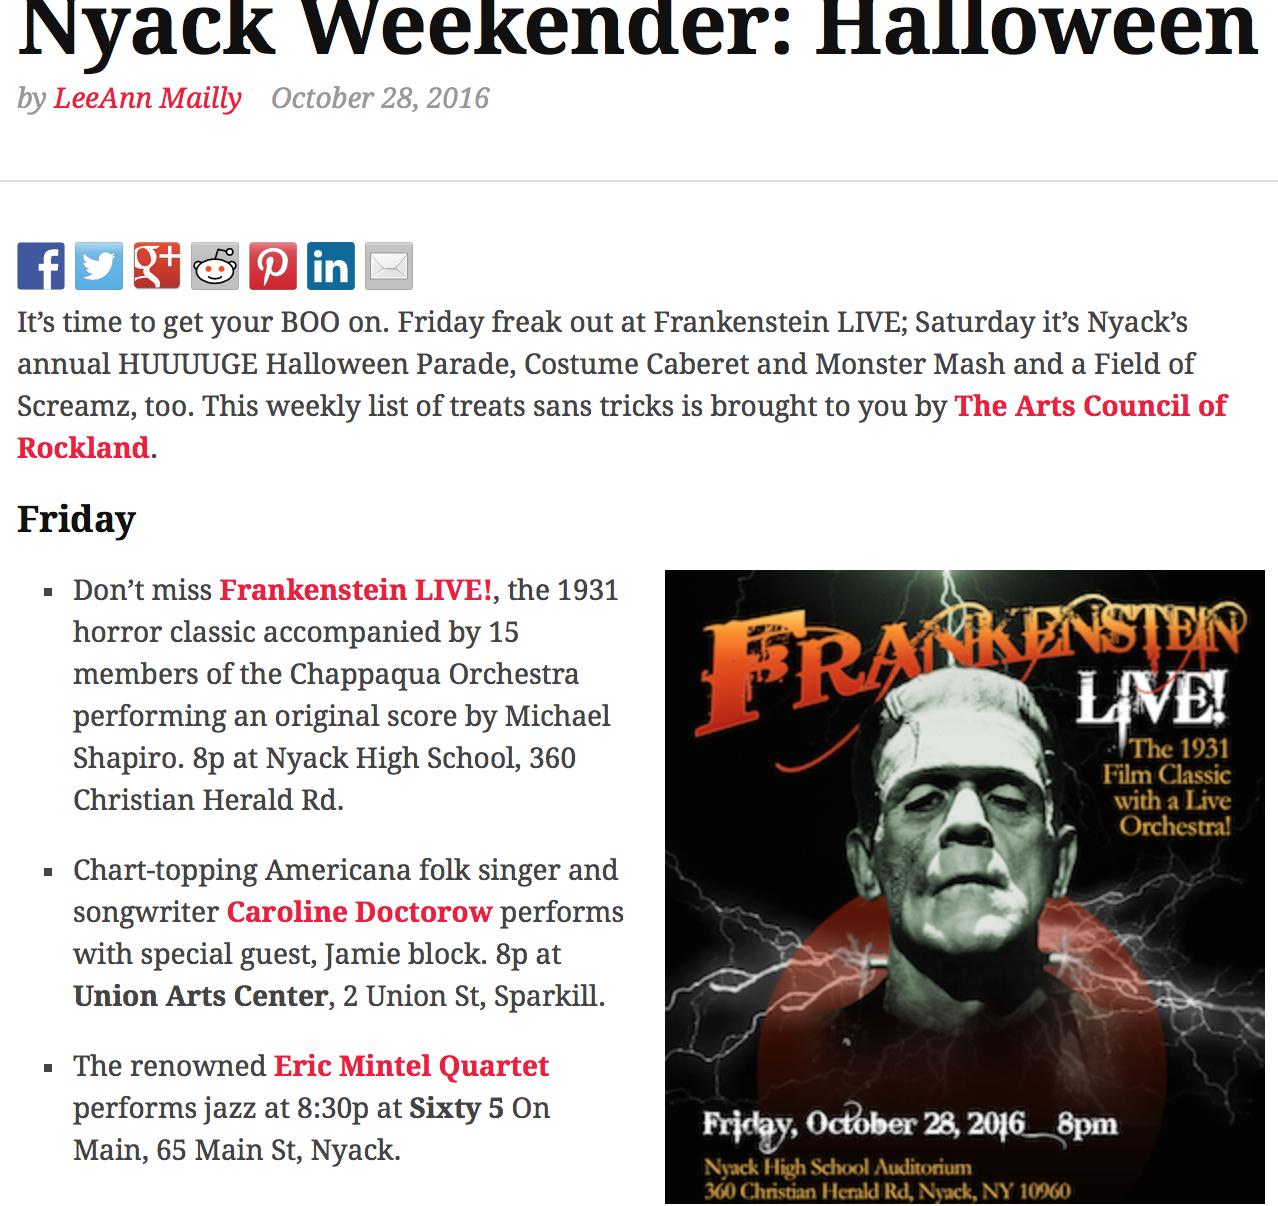 Nyack Halloween Weekend at Sixty5 on Main